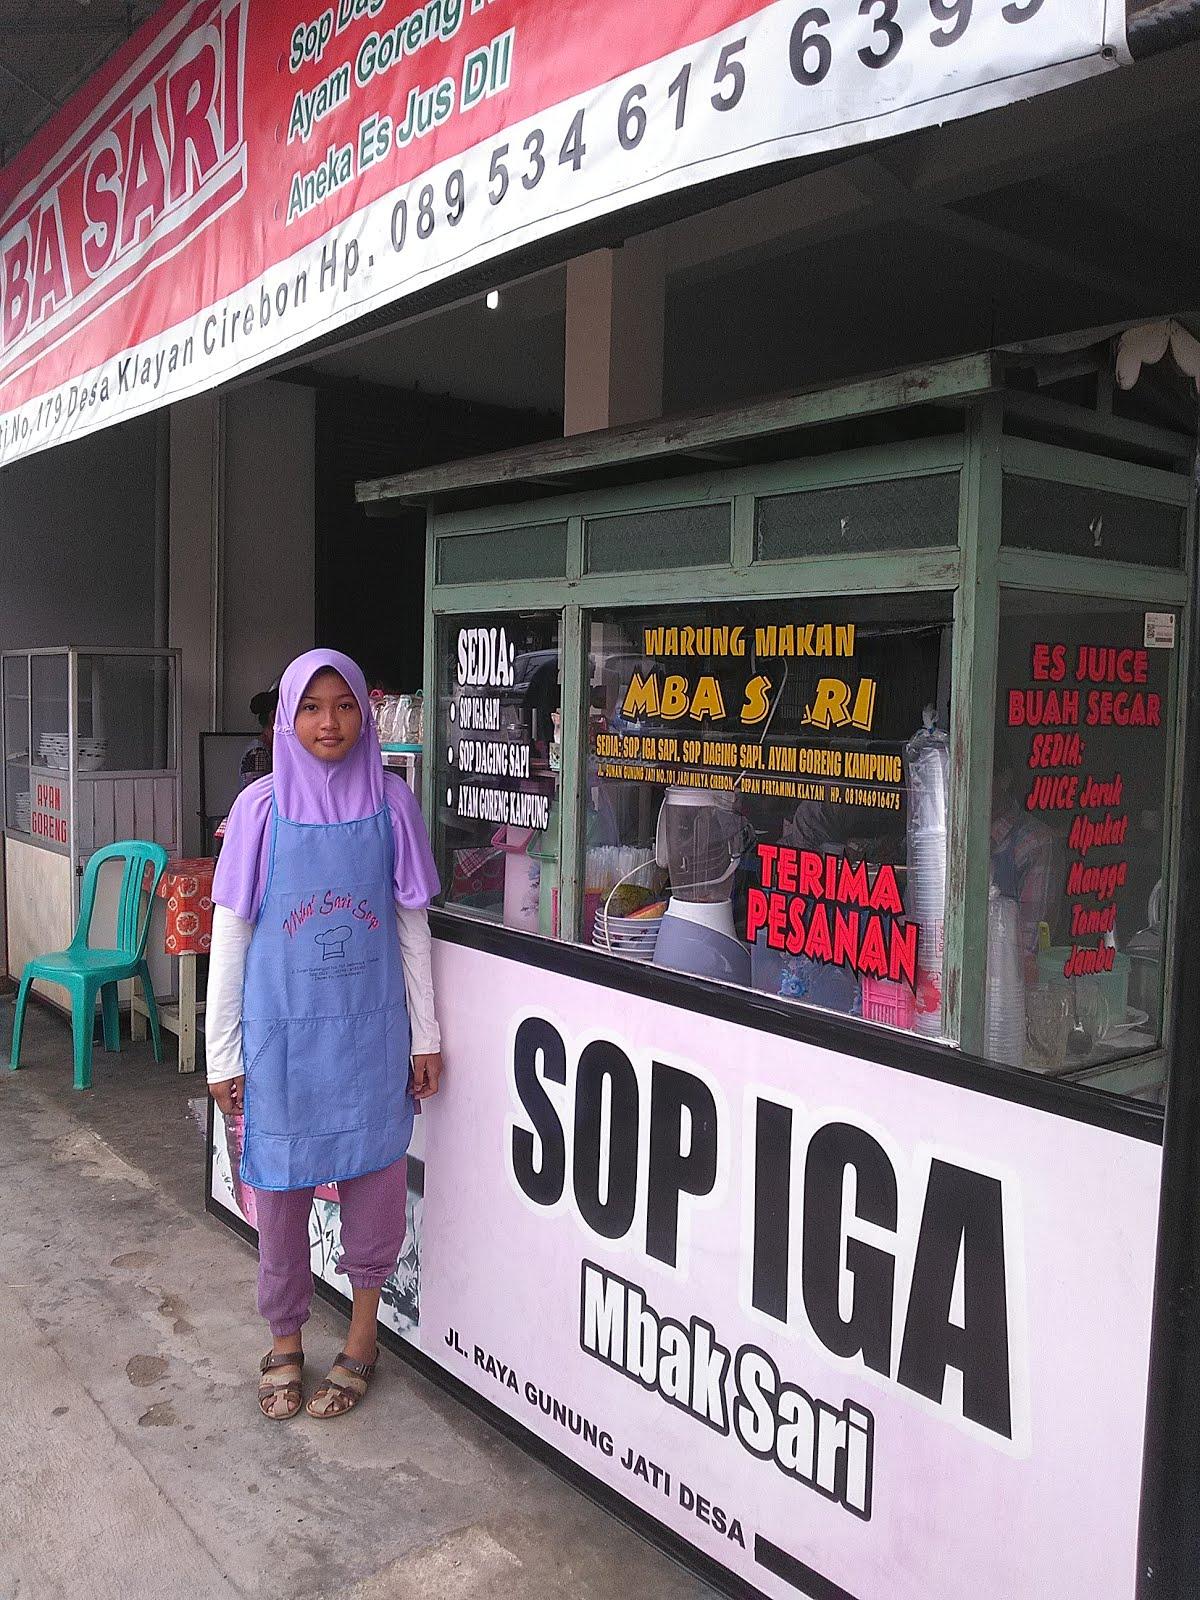 Sop Iga Sapi Cirebon